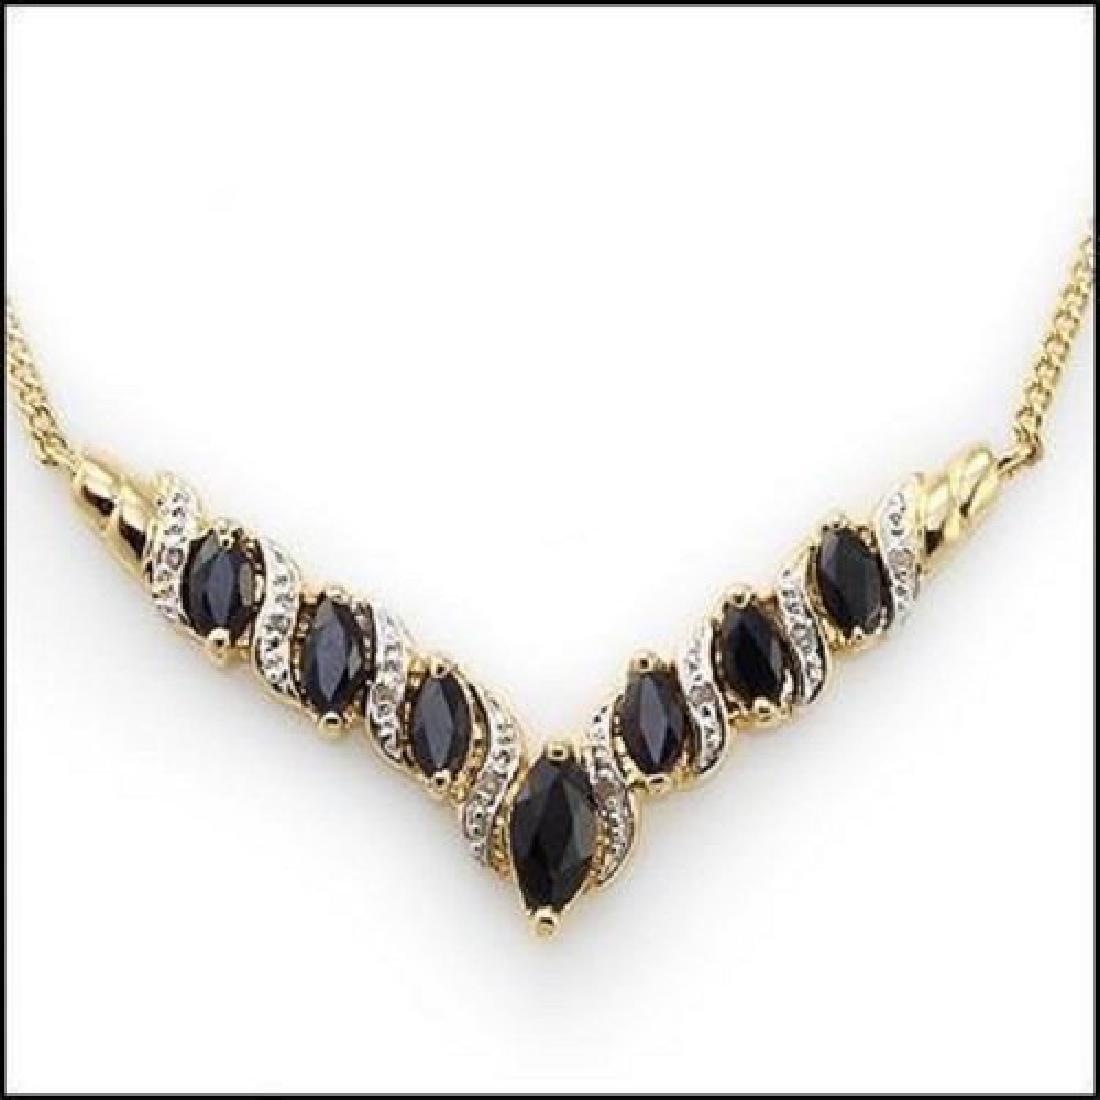 6.92 CT Sapphire & Diamond Designer Necklace MSRP $1120 - 2